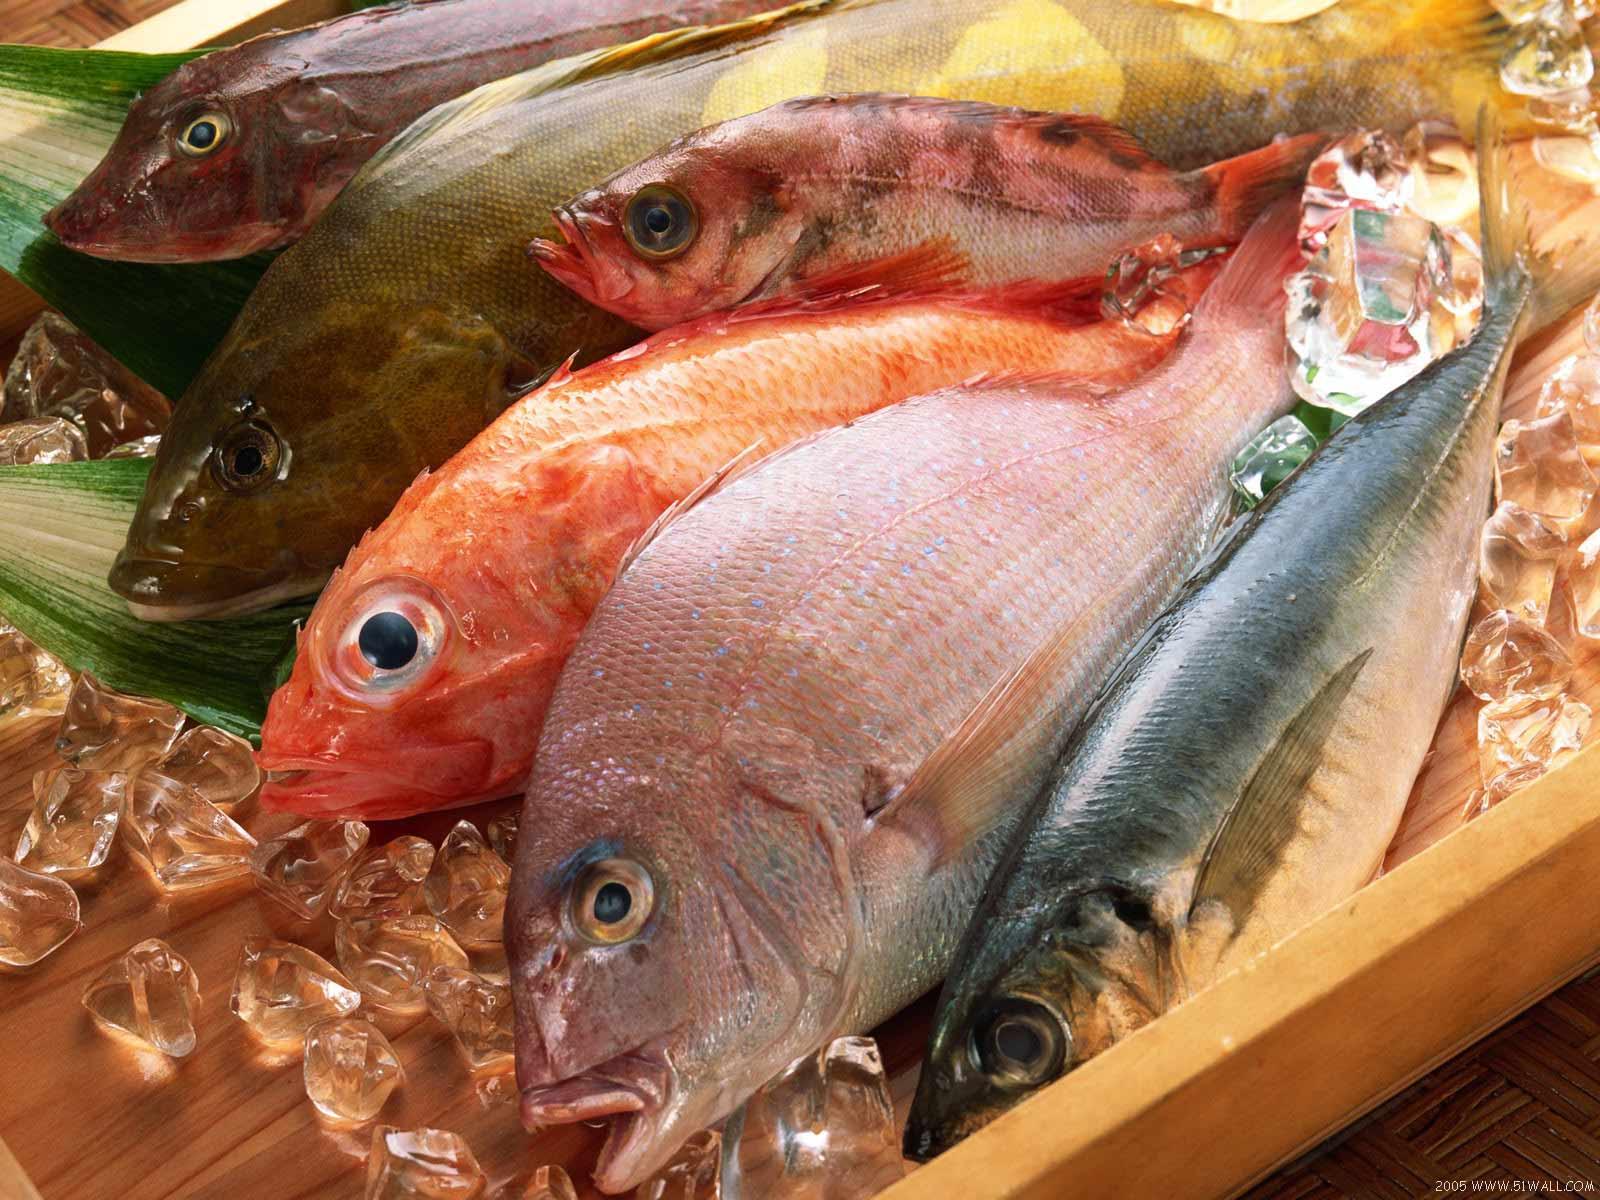 http://www.almrsal.com/wp-content/uploads/2014/04/Fish3.jpg